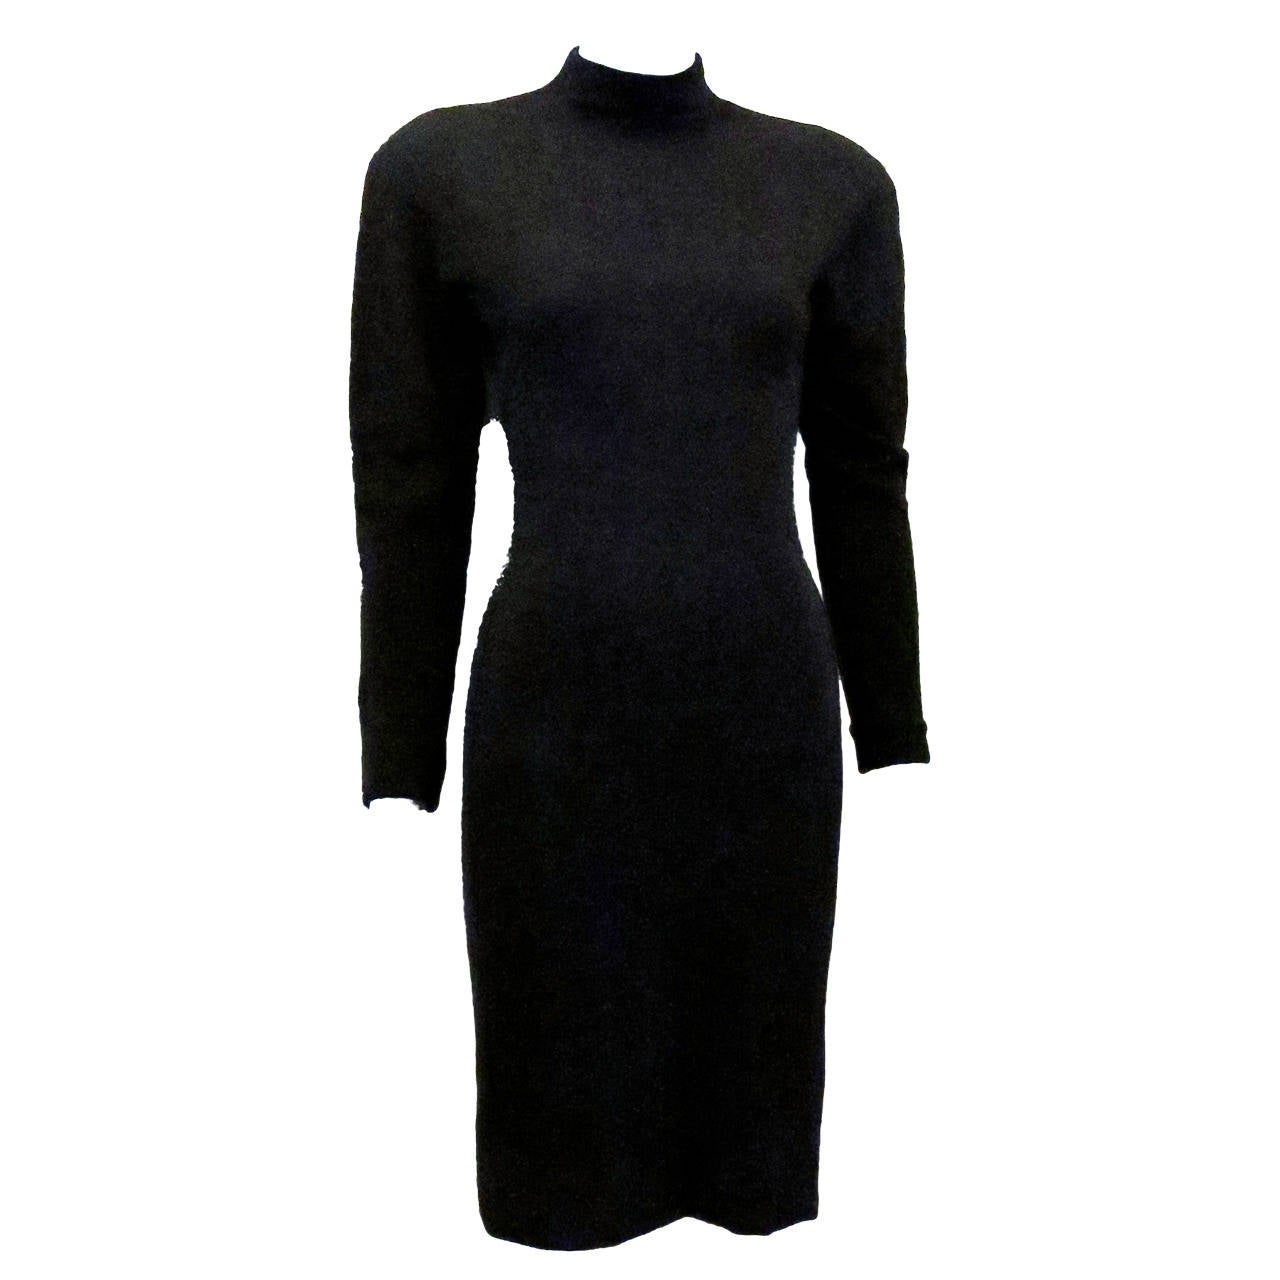 HALSTON Grey Wool Knit Mock Turtleneck Dress For Sale